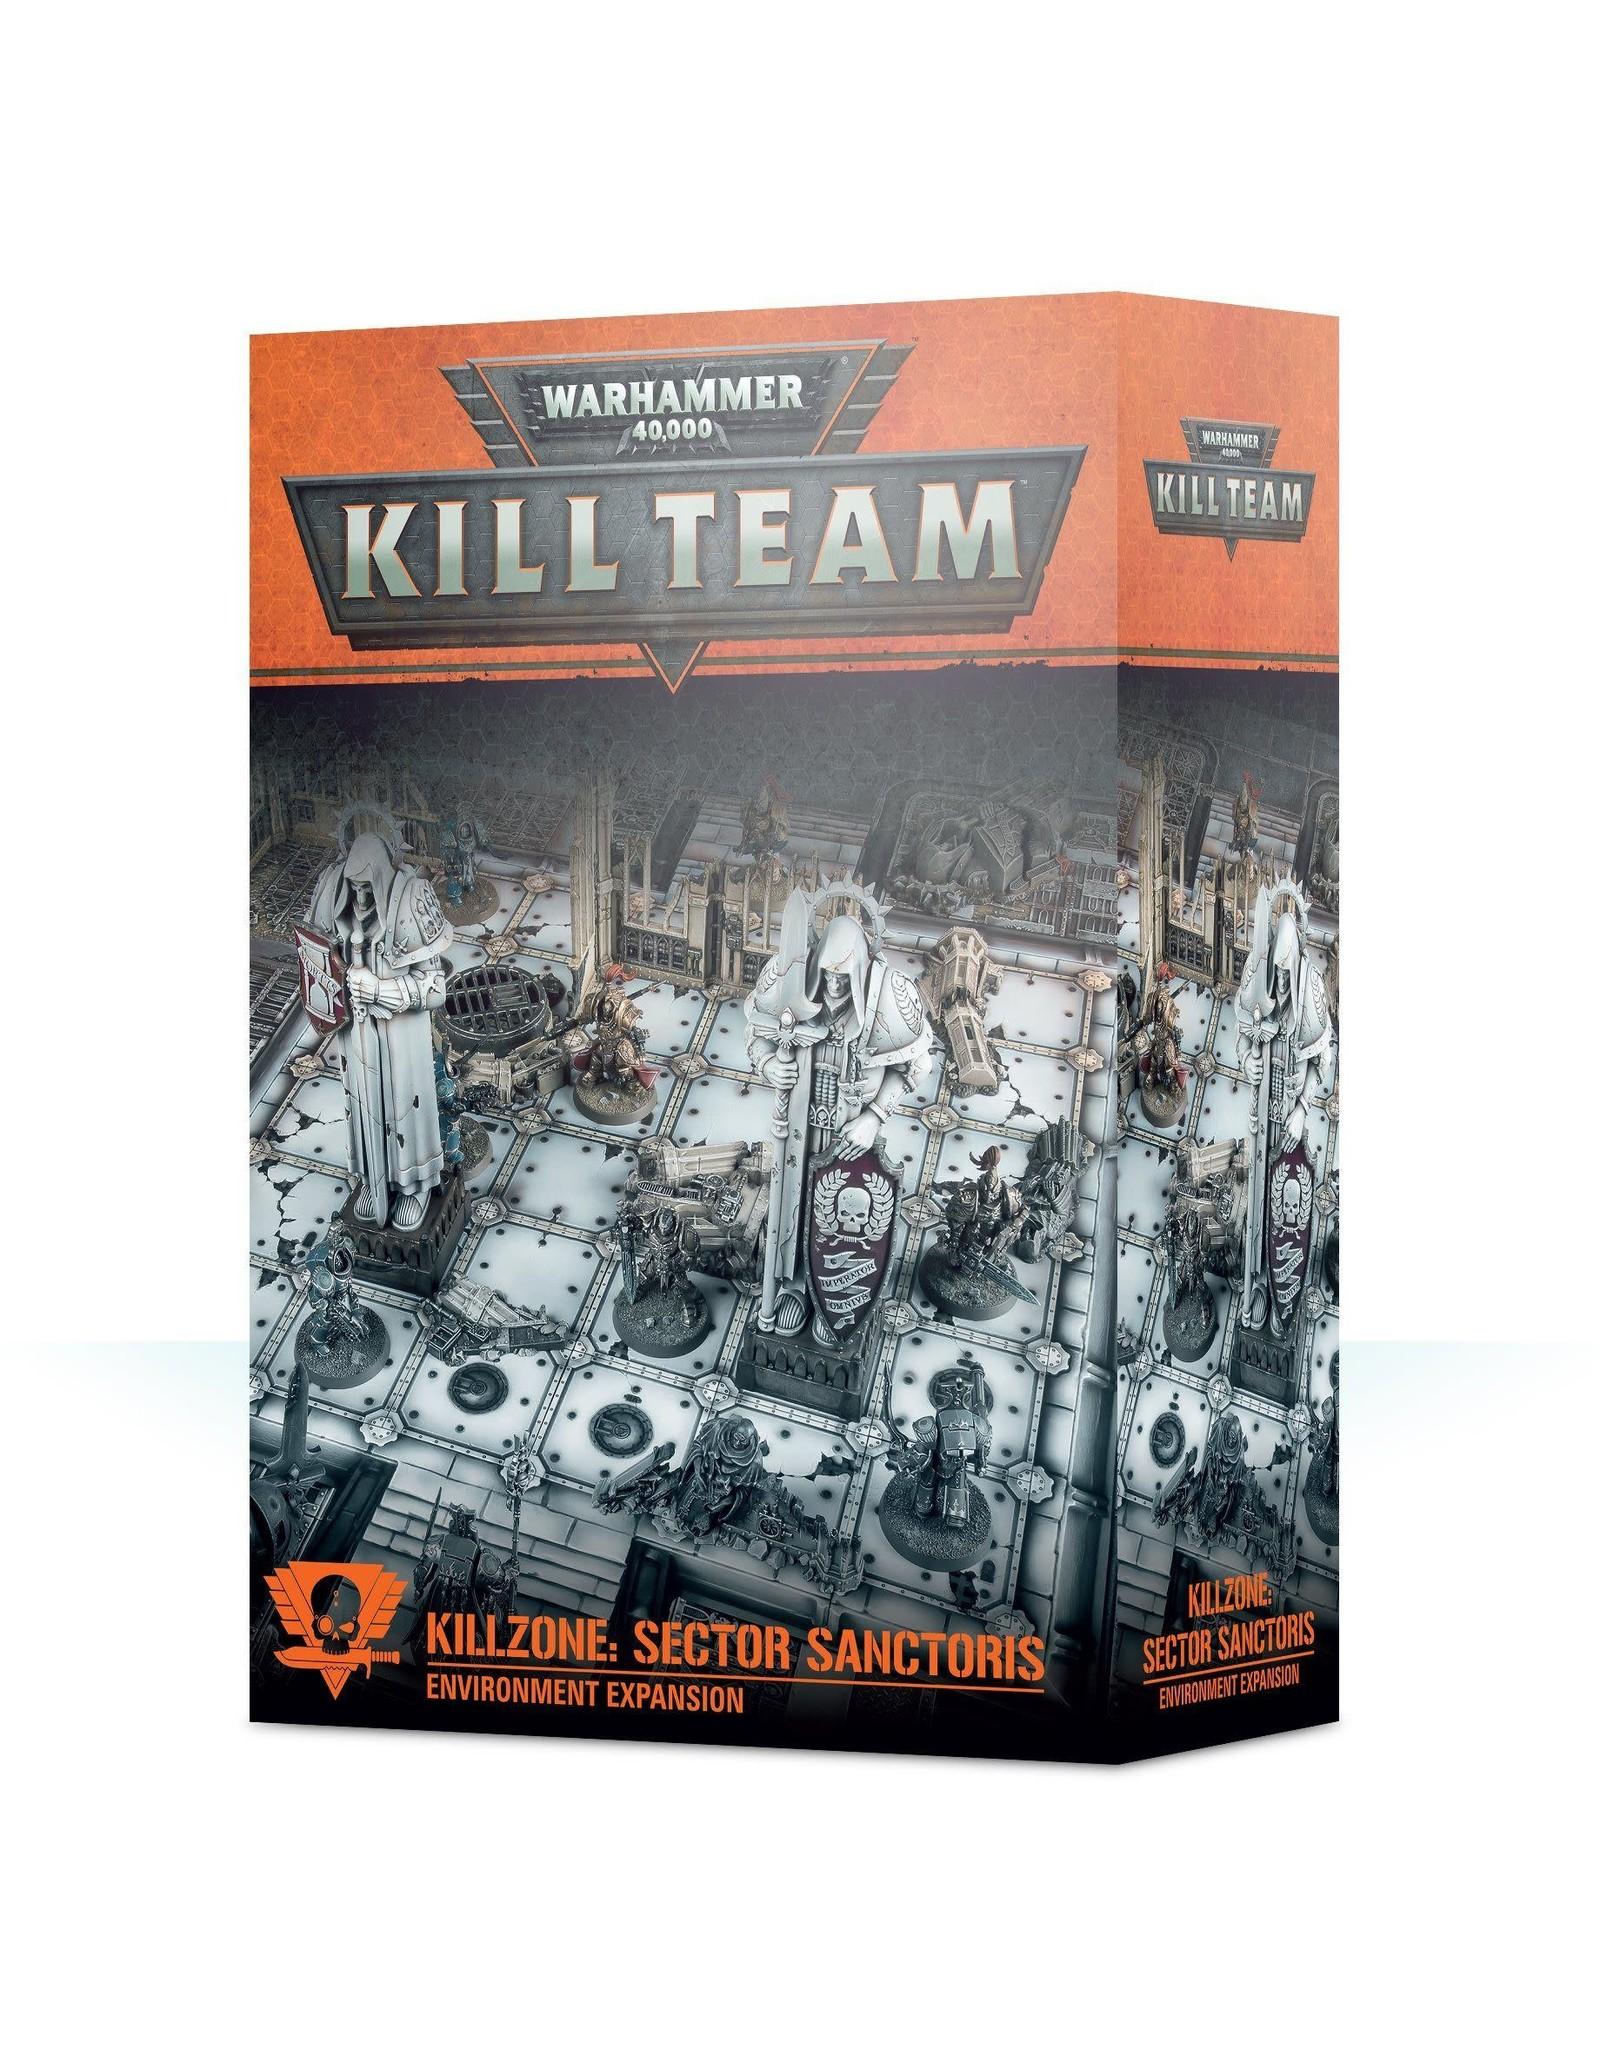 Games Workshop KILLZONE: SECTOR SANCTORIS